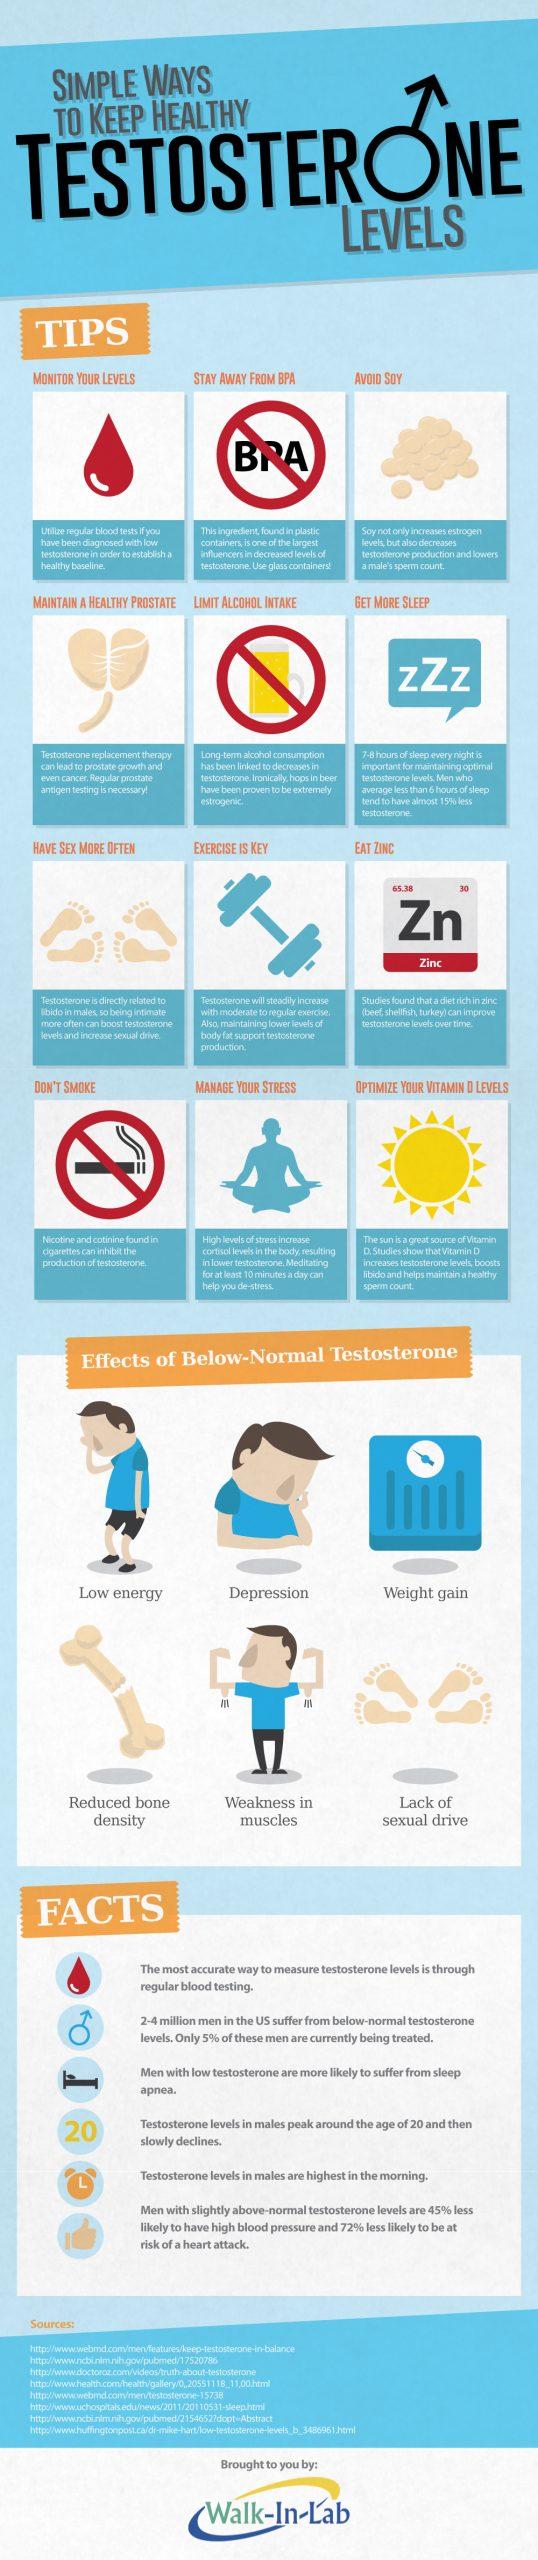 Simple Ways To Keep Healthy Testosterone